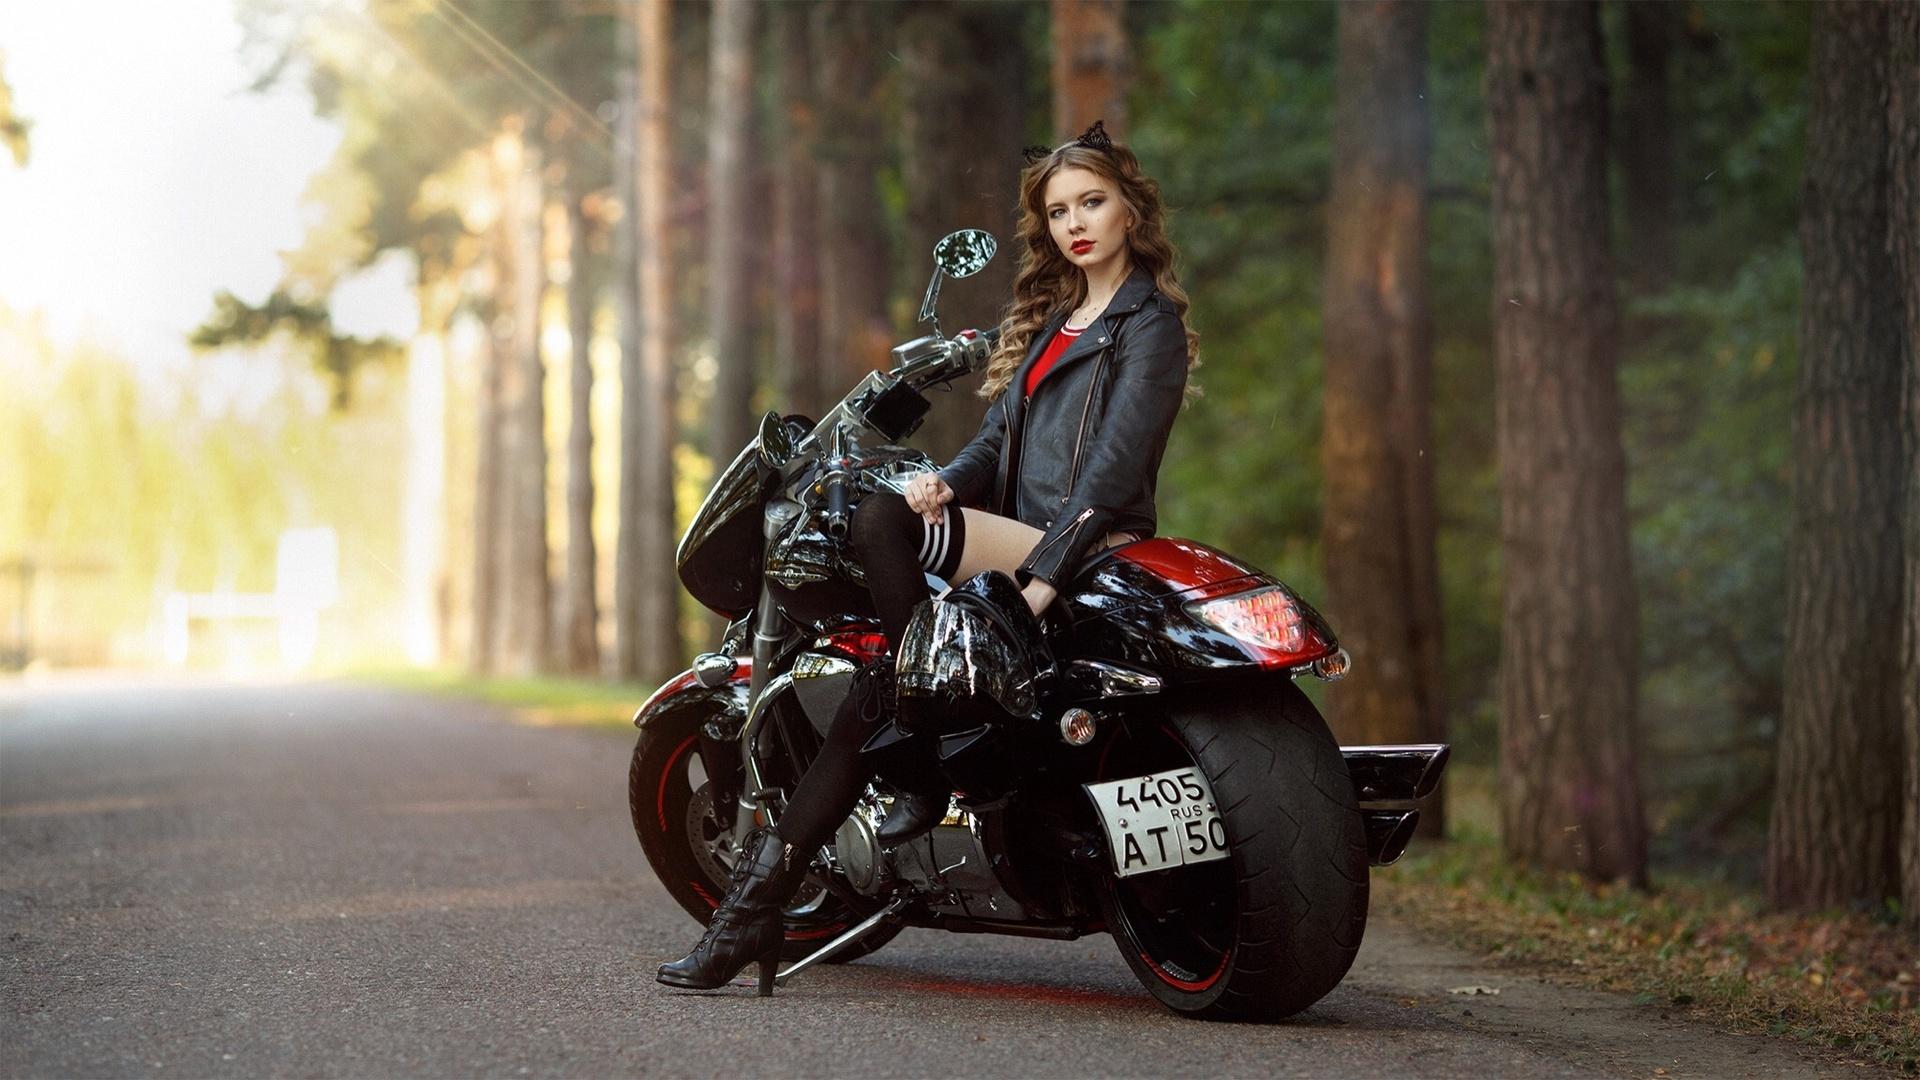 devushki-vozle-mototsikla-foto-devchonka-pokazivaet-svoyu-dirku